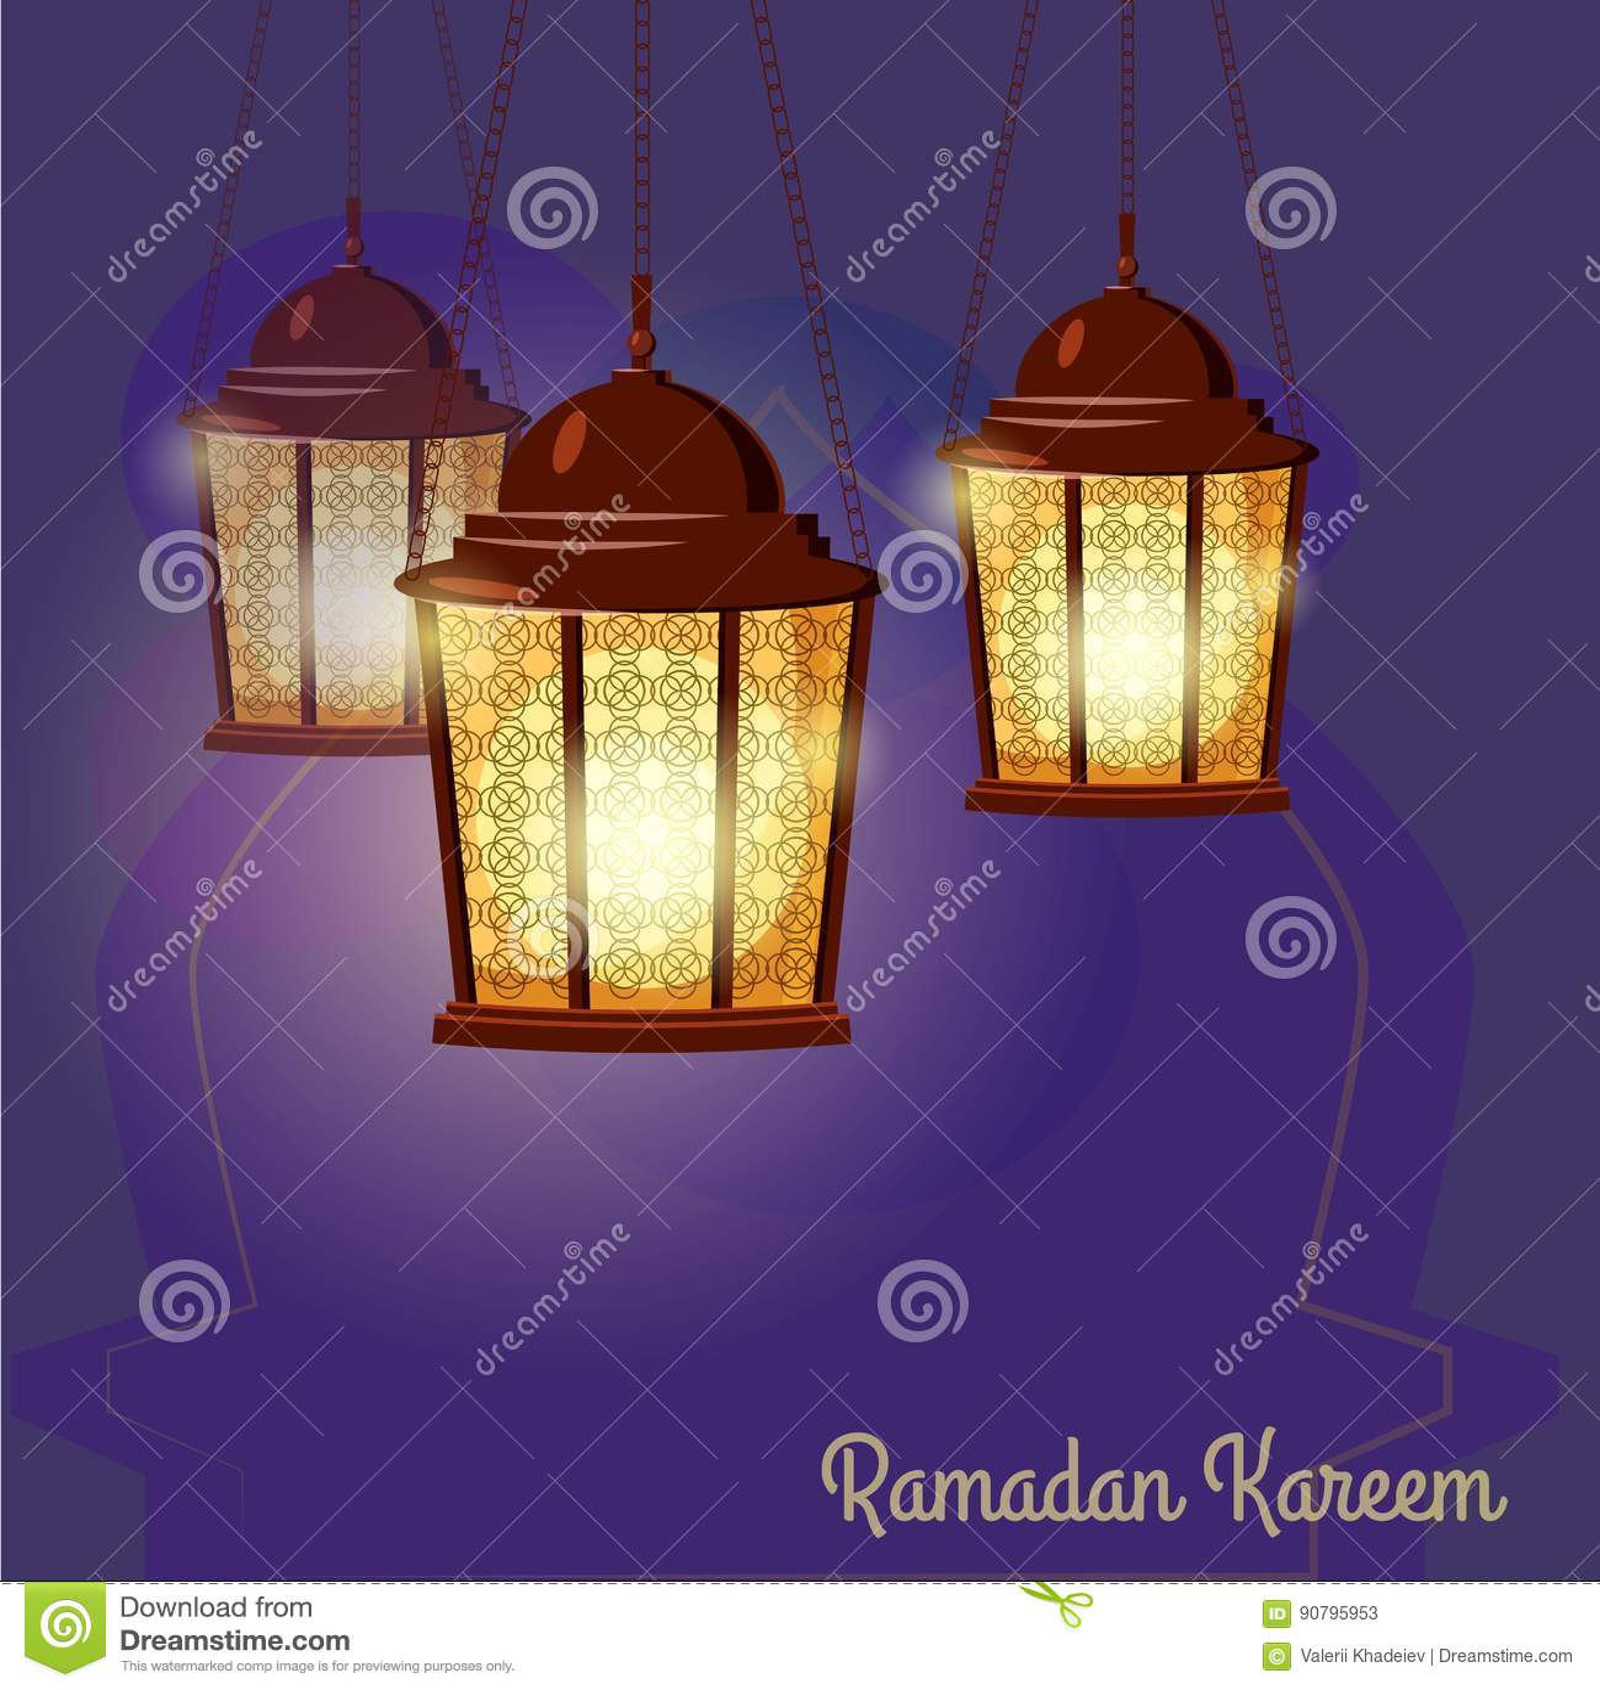 Ramadan Kareem Greetings Intricate Arabic lampor, illustration